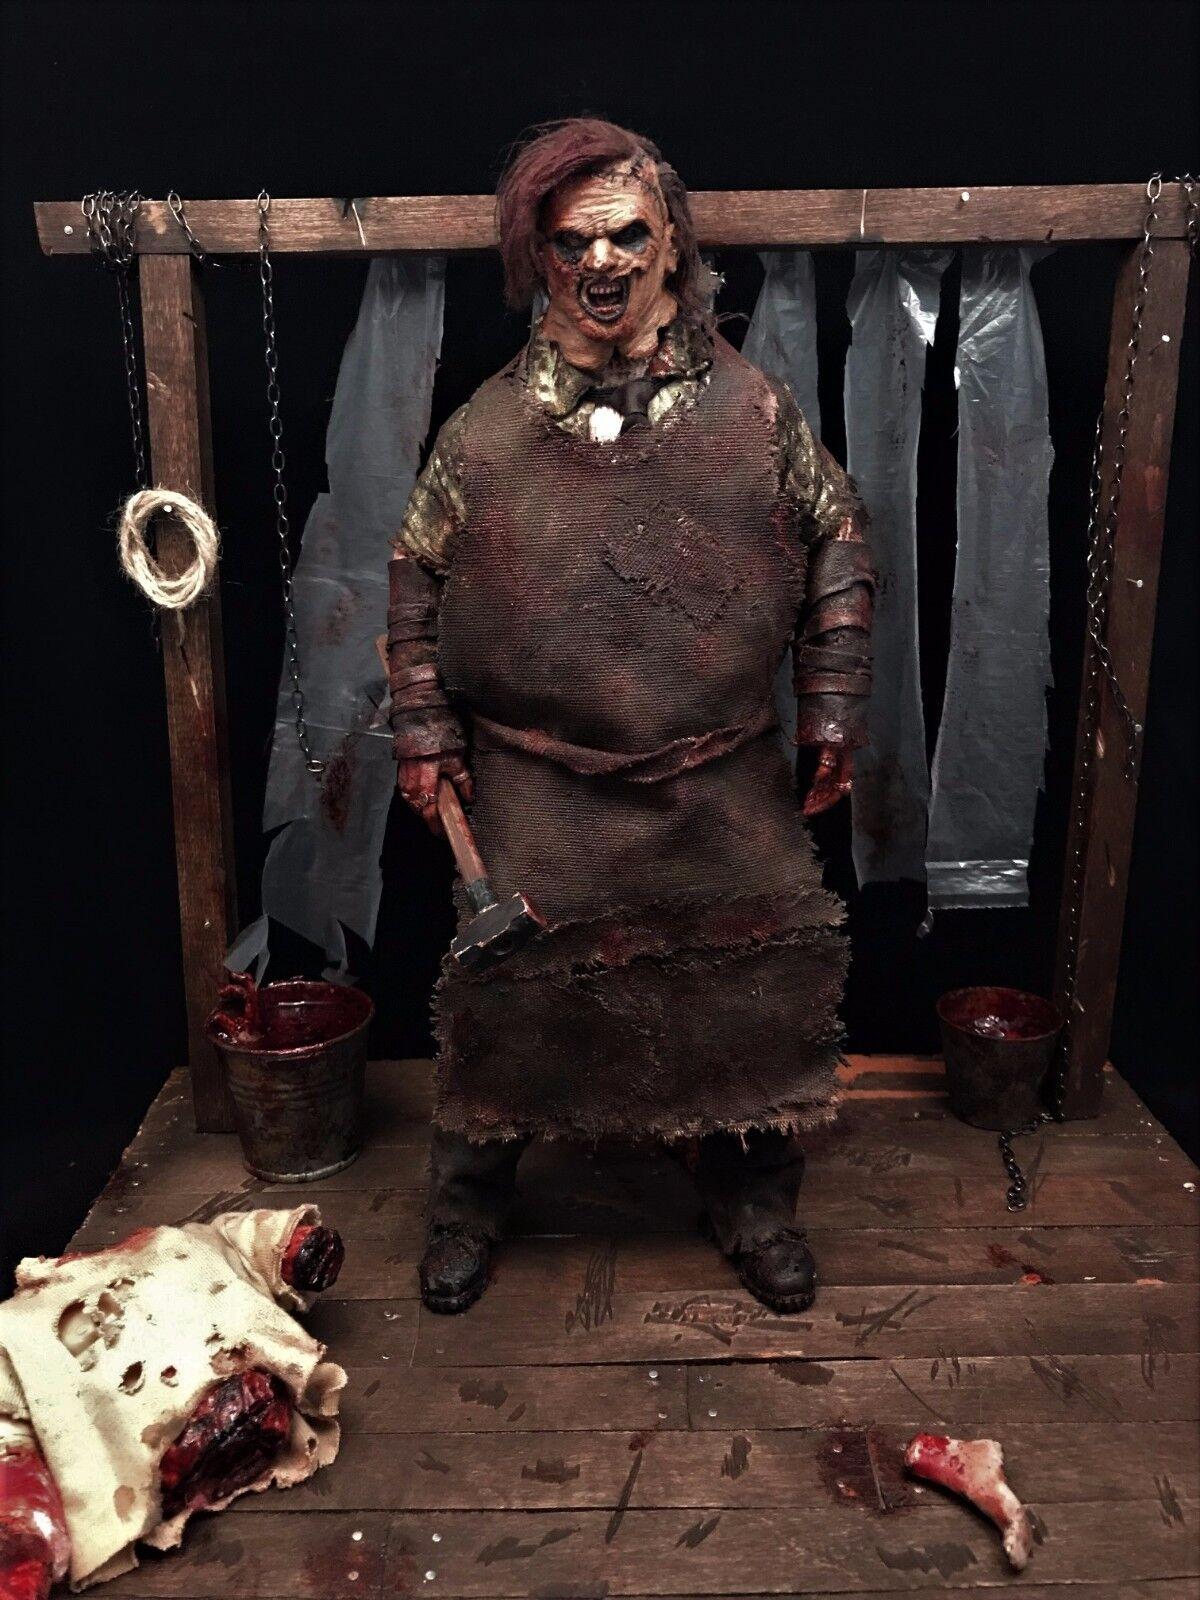 1 6 Texas Chainsaw Massacre Leatherface Diorama for Sideshow Hot Toys Threezero